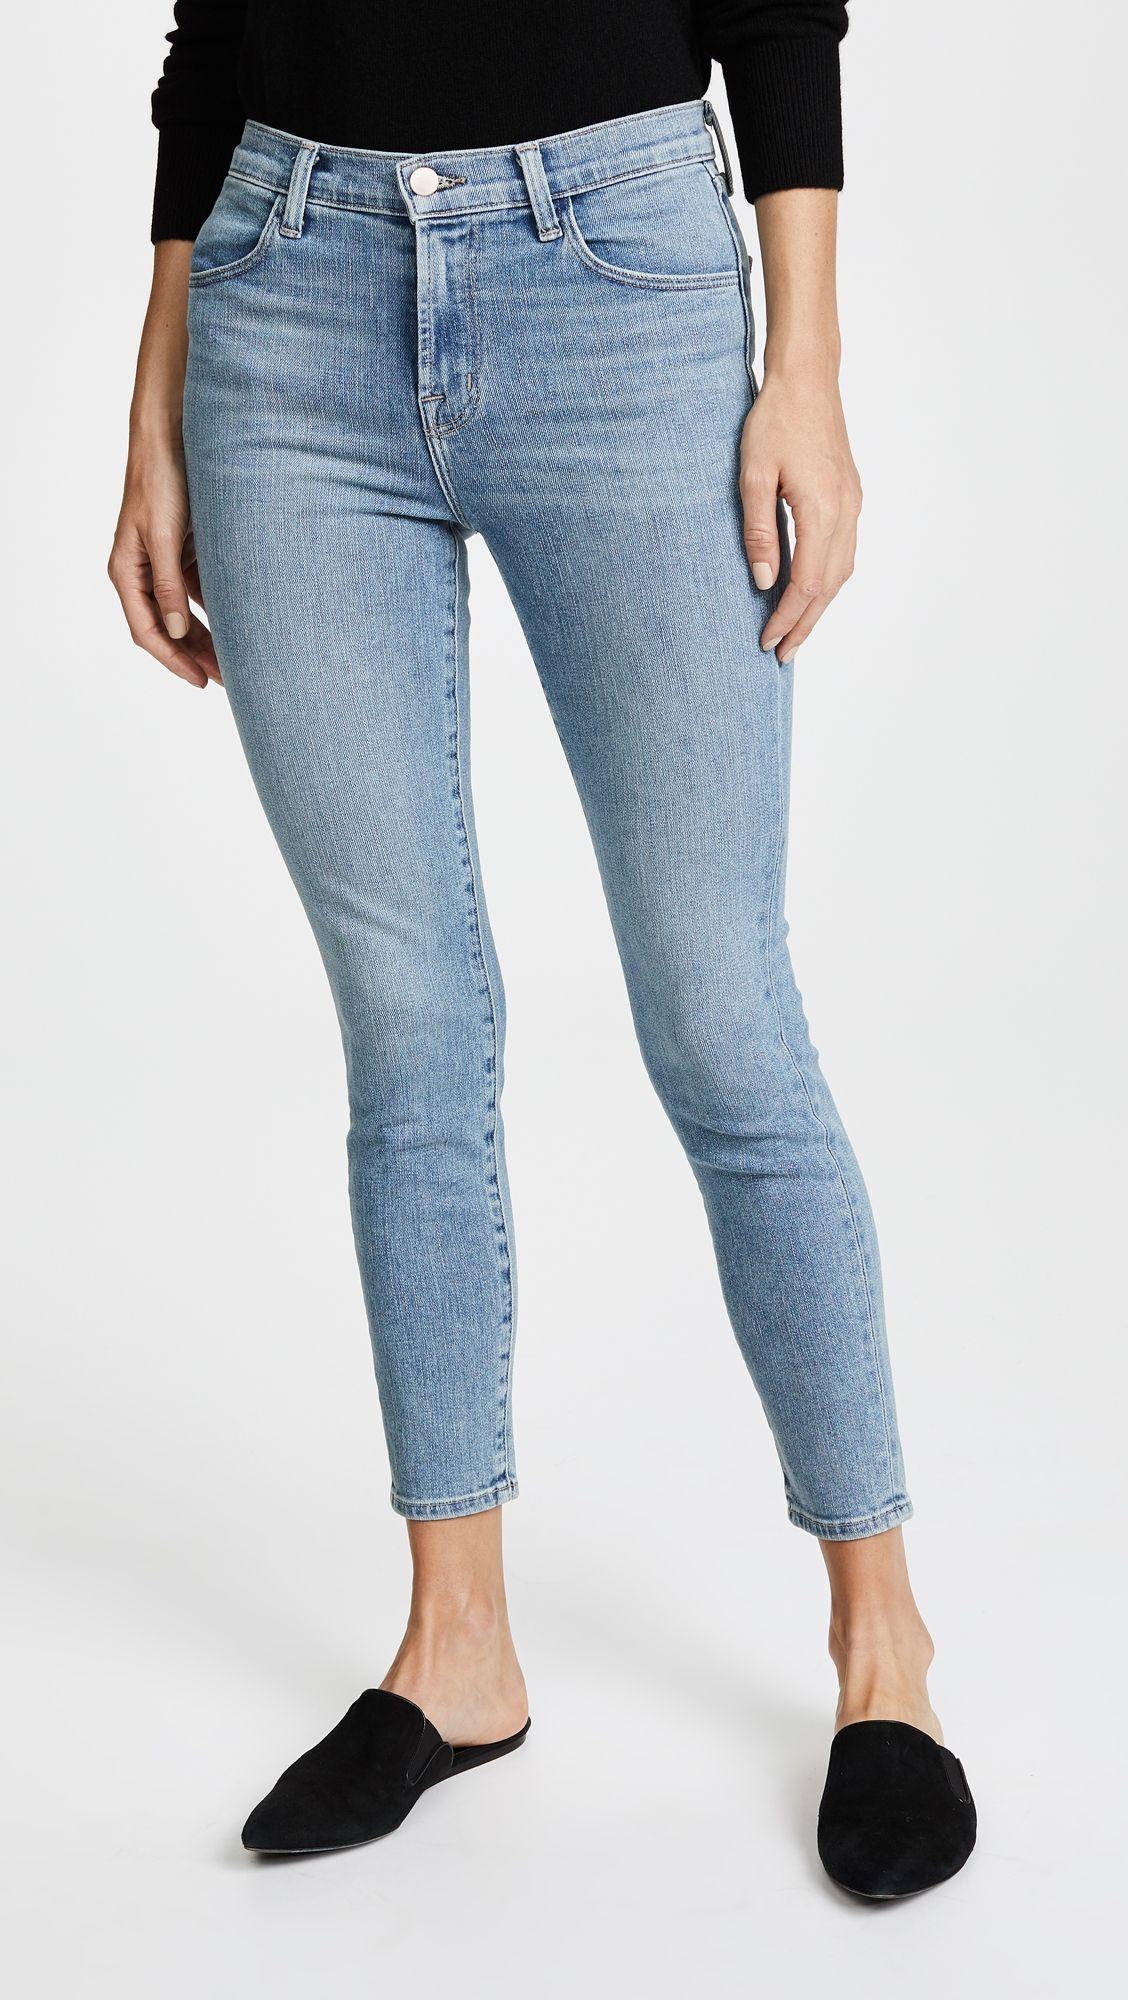 d3ab8851d154d J Brand Alana High Rise Crop Skinny Jeans